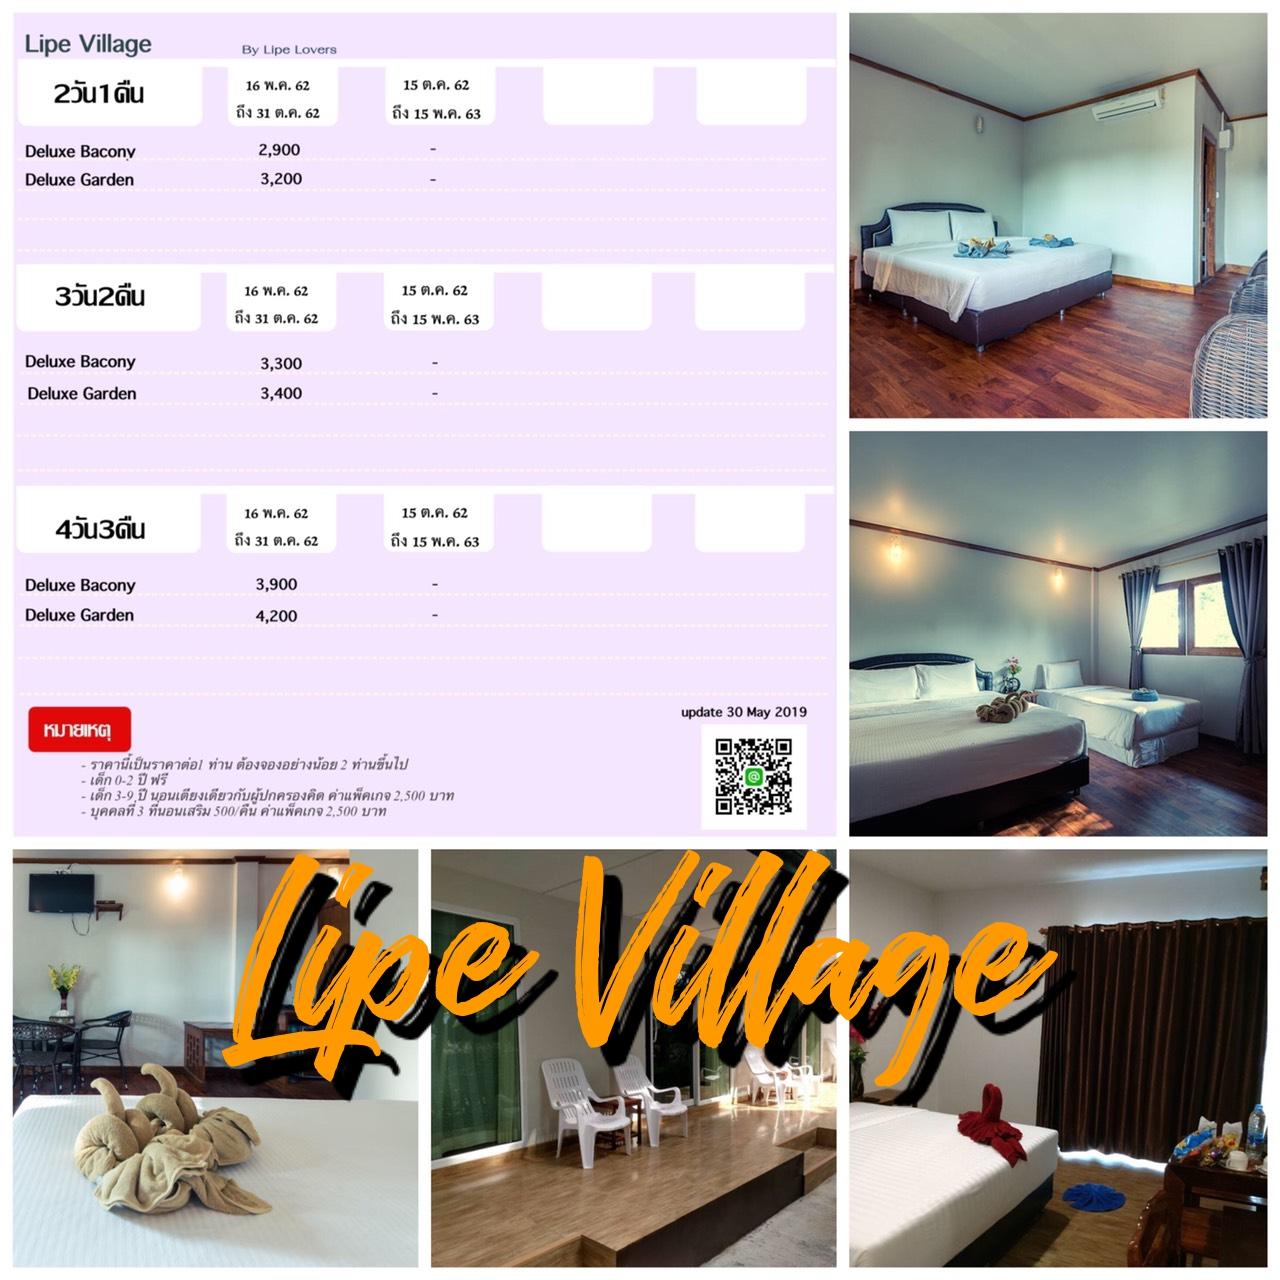 Lipe village